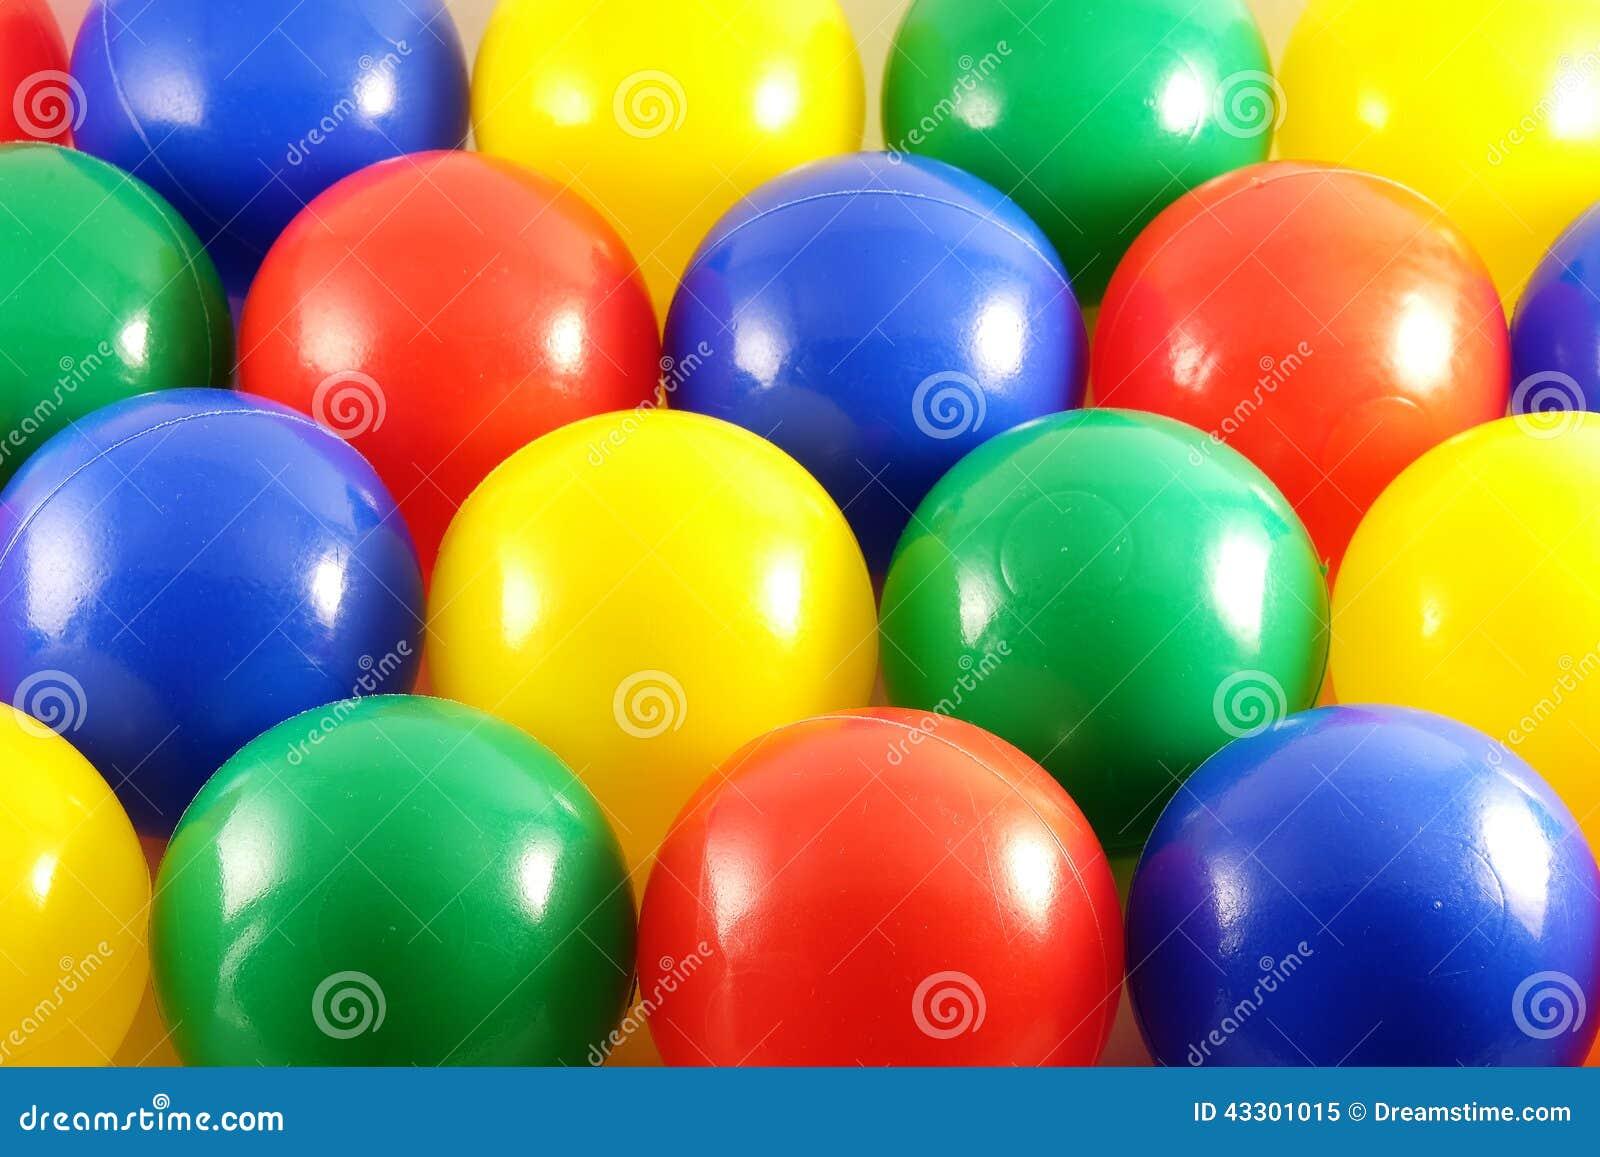 Fundo de bolas multi-coloridas